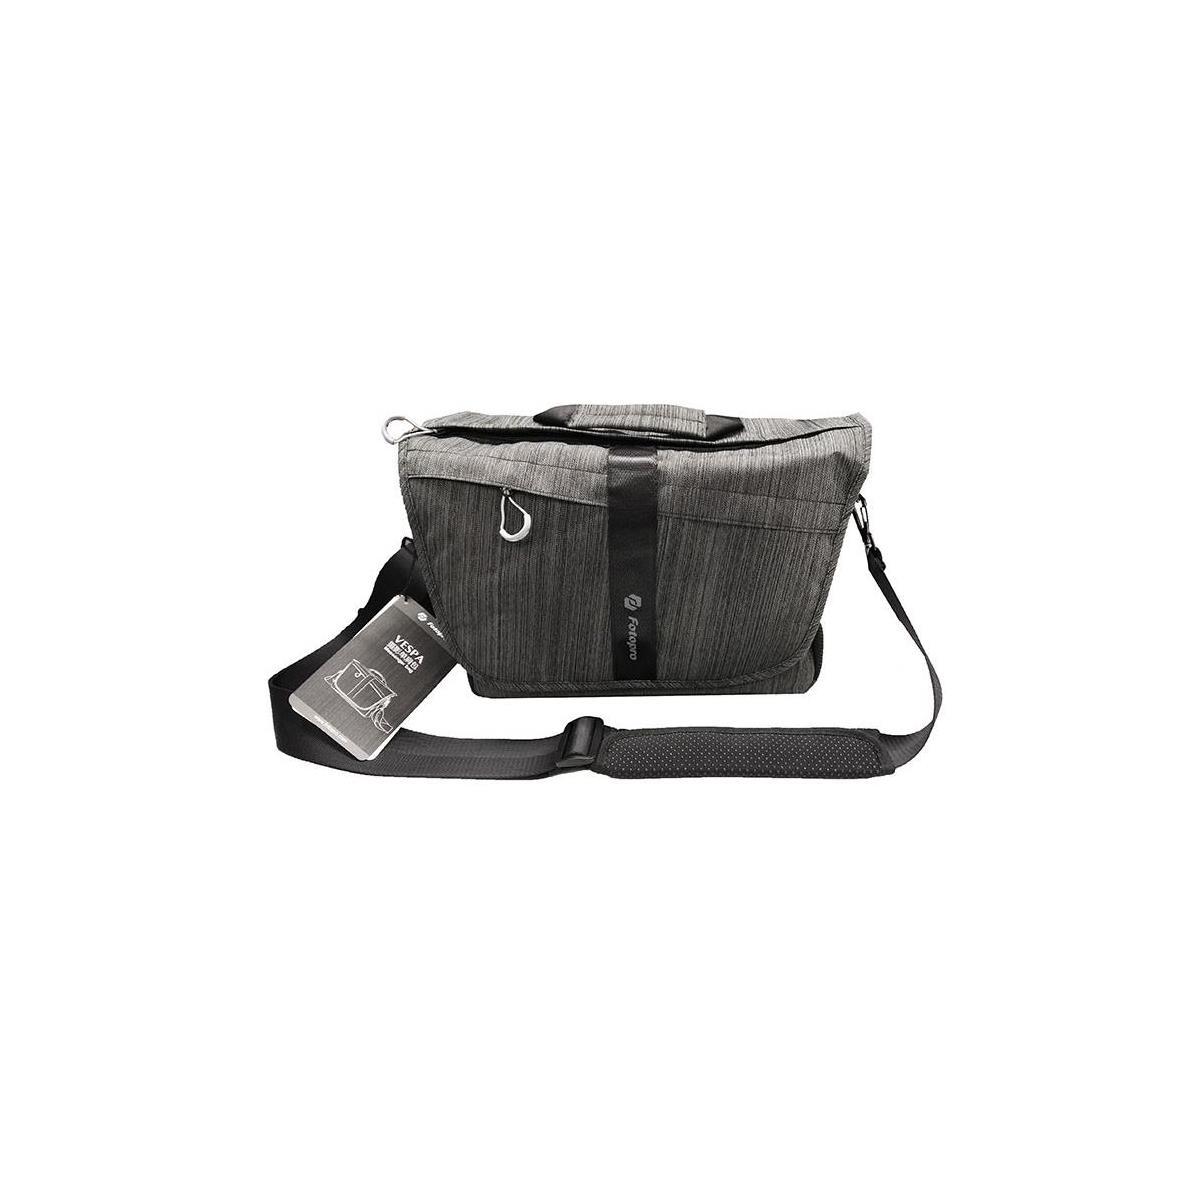 Fotopro Vespa Camera/Laptop Messenger Bag (Charcoal) $20 + Free Shipping